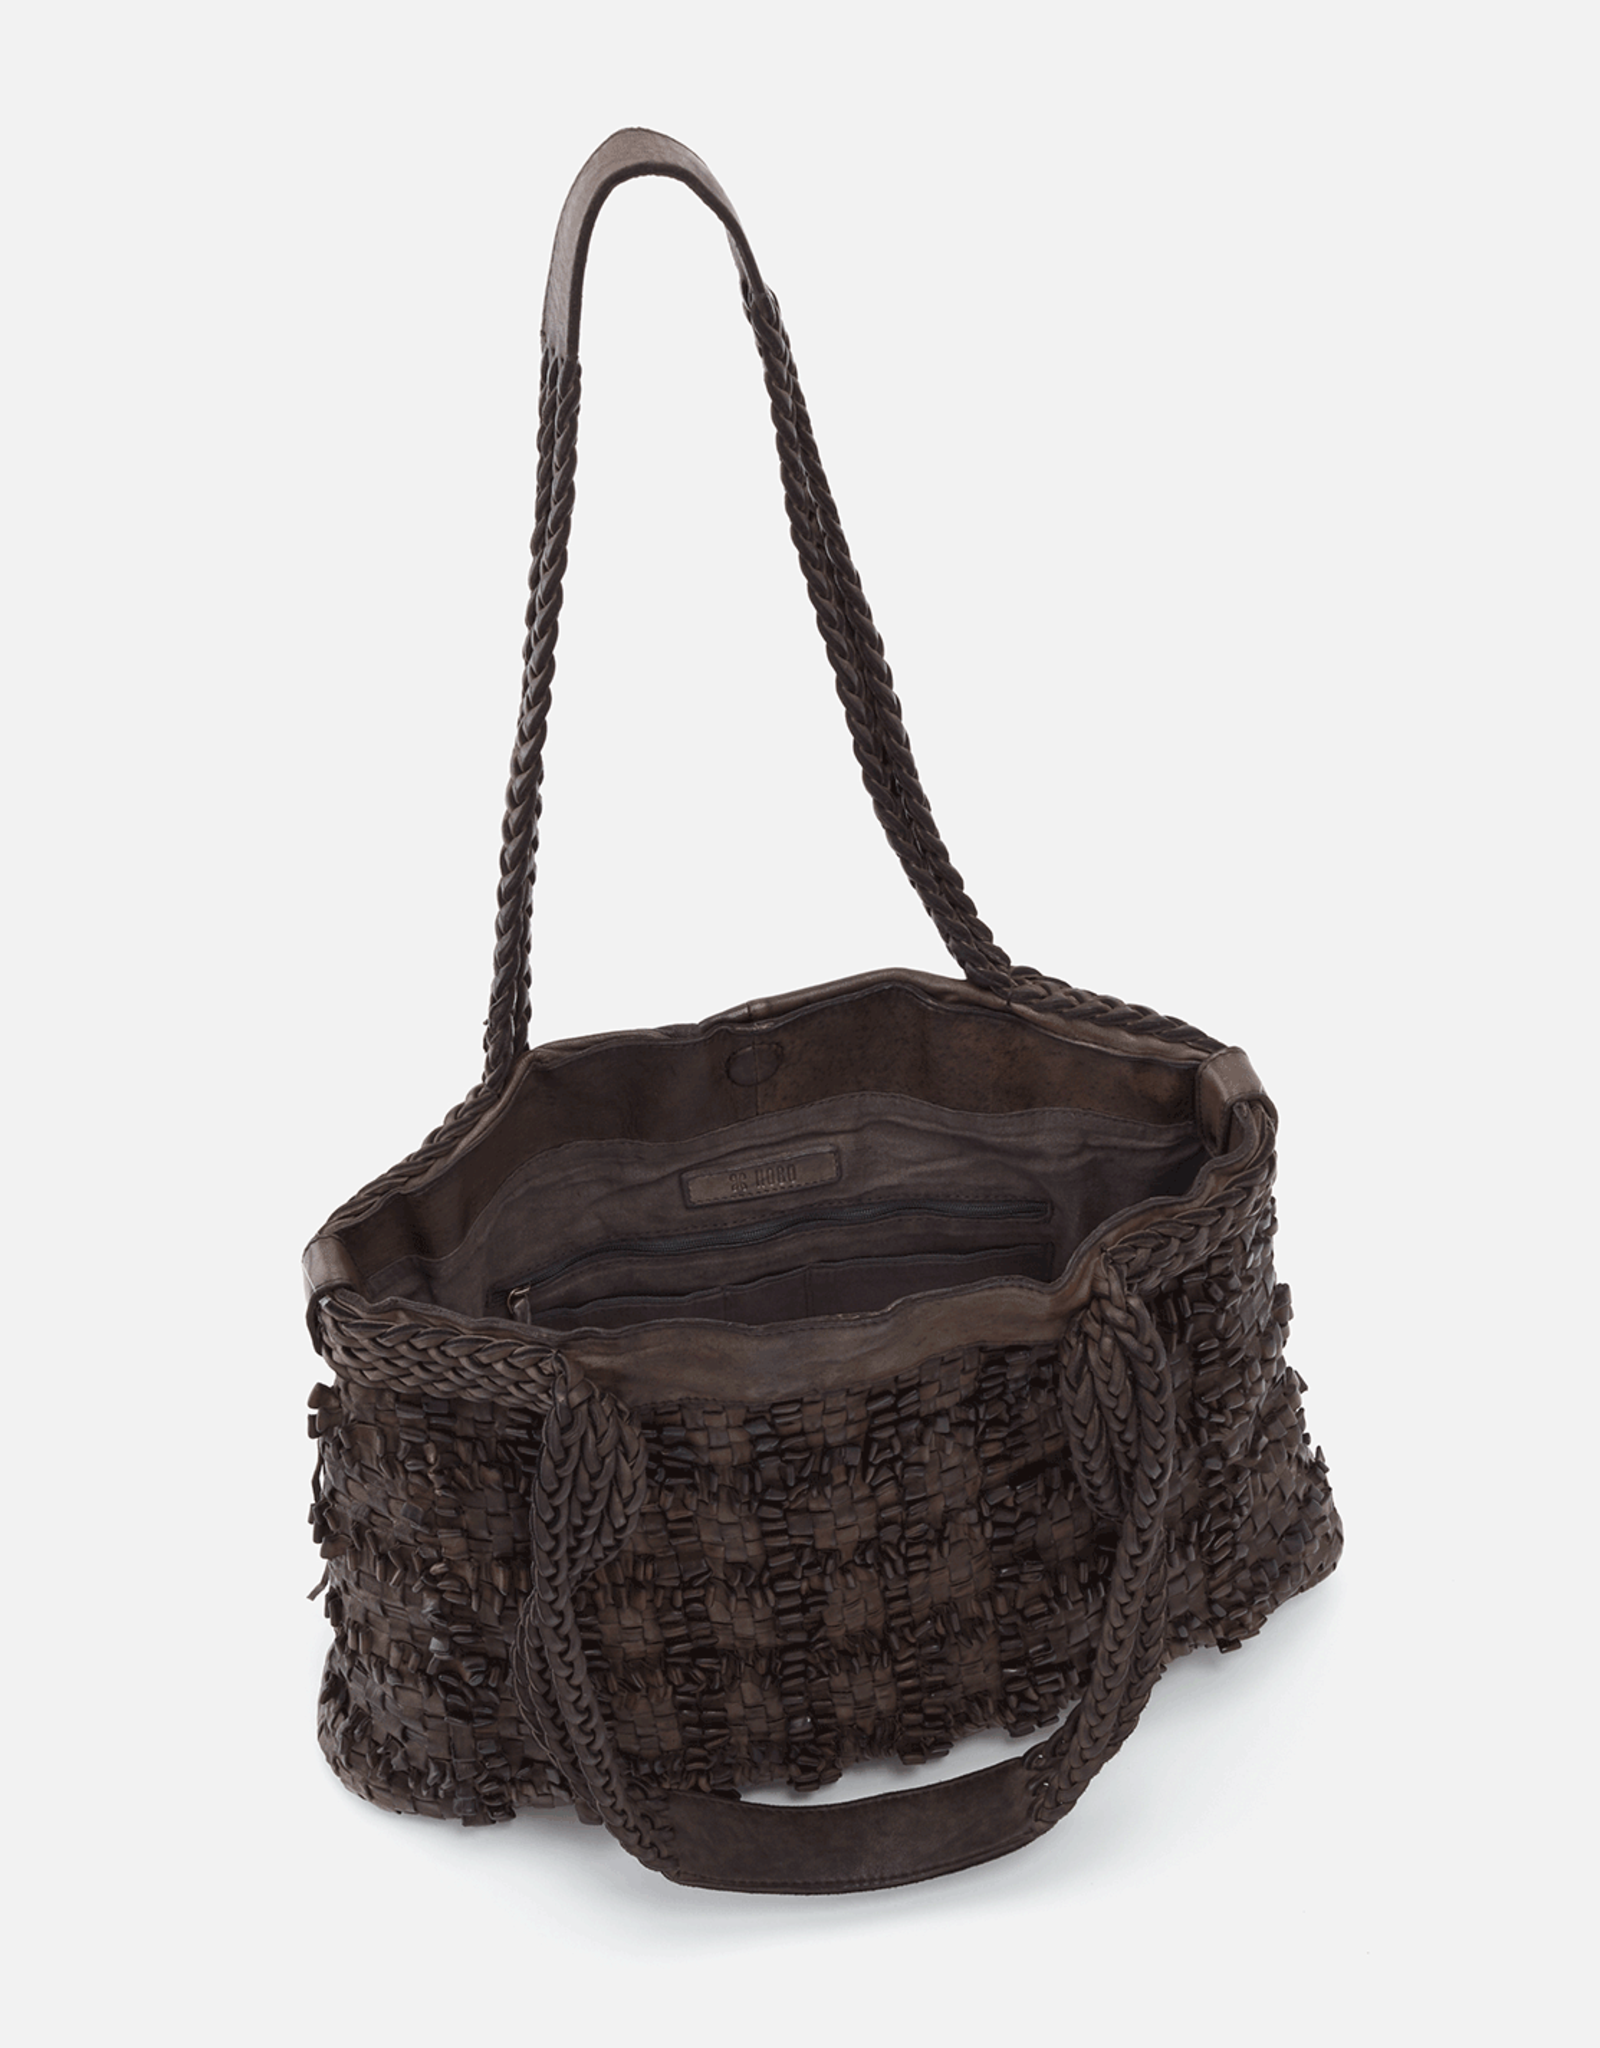 HOBO HOBO Forge Handbag